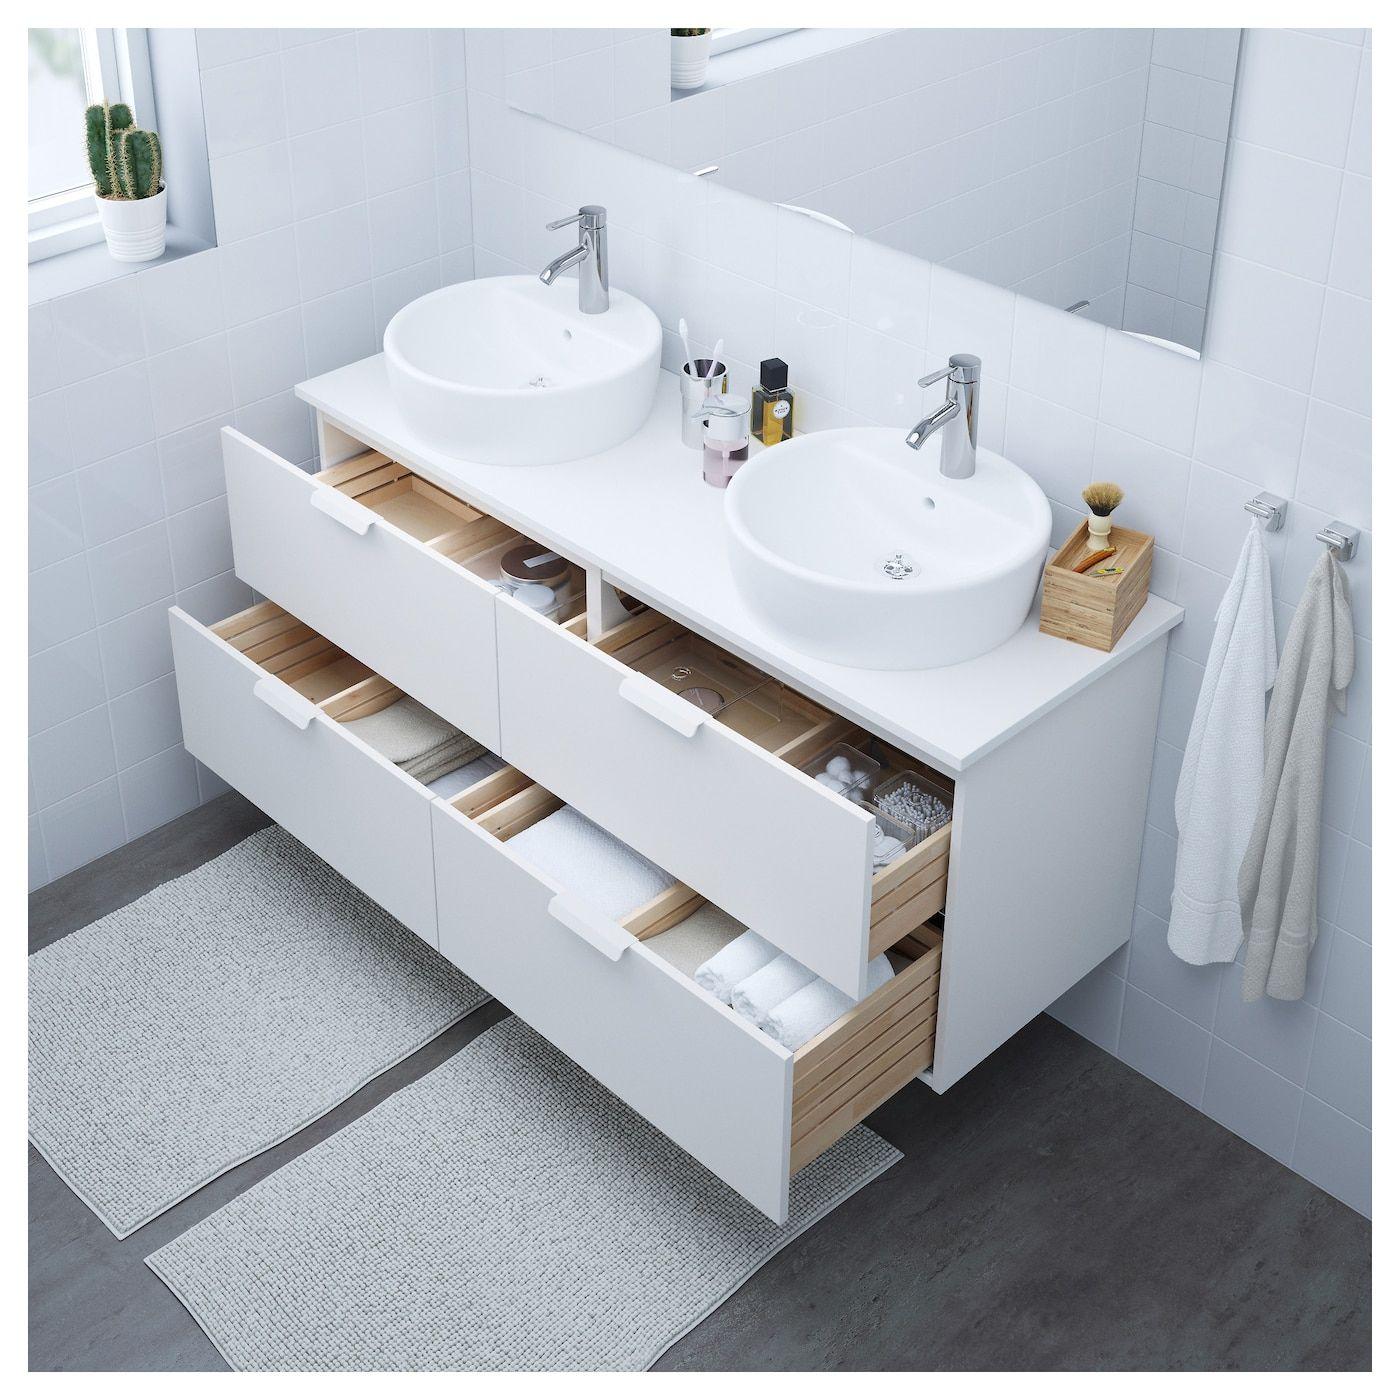 Godmorgon Bathroom Vanity White Canada Ikea White Vanity Bathroom Ikea Vanity Ikea Godmorgon